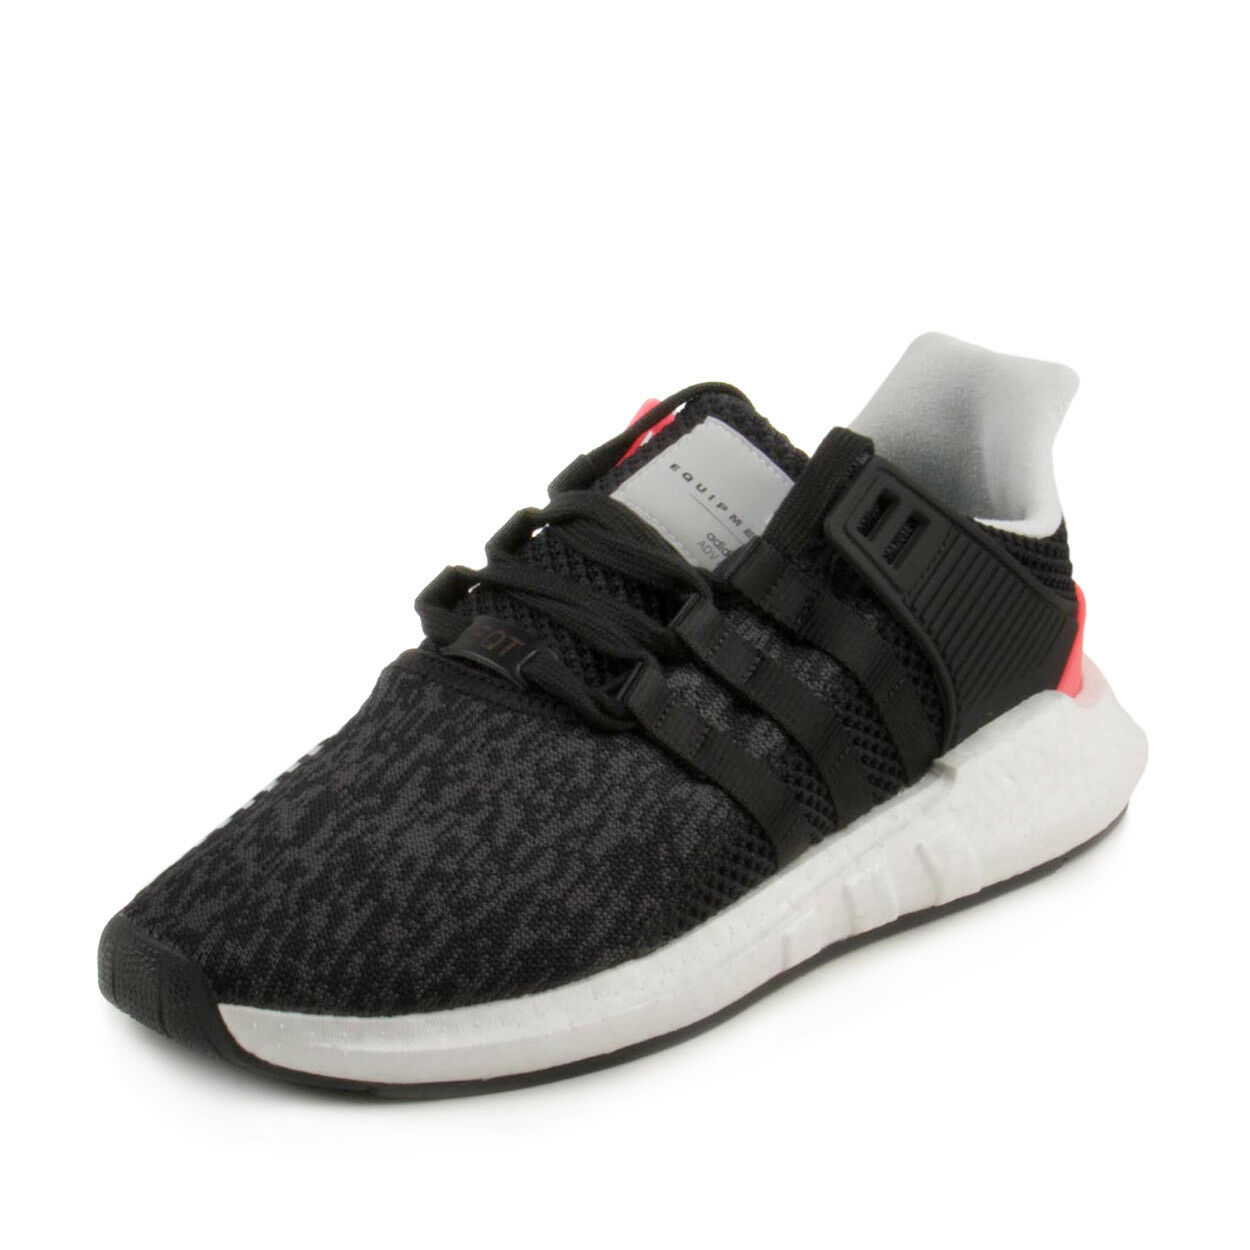 Adidas Mens EQT Support Black/White-Infrared 93/17 Black/White-Infrared Support BB1234 d42f1e